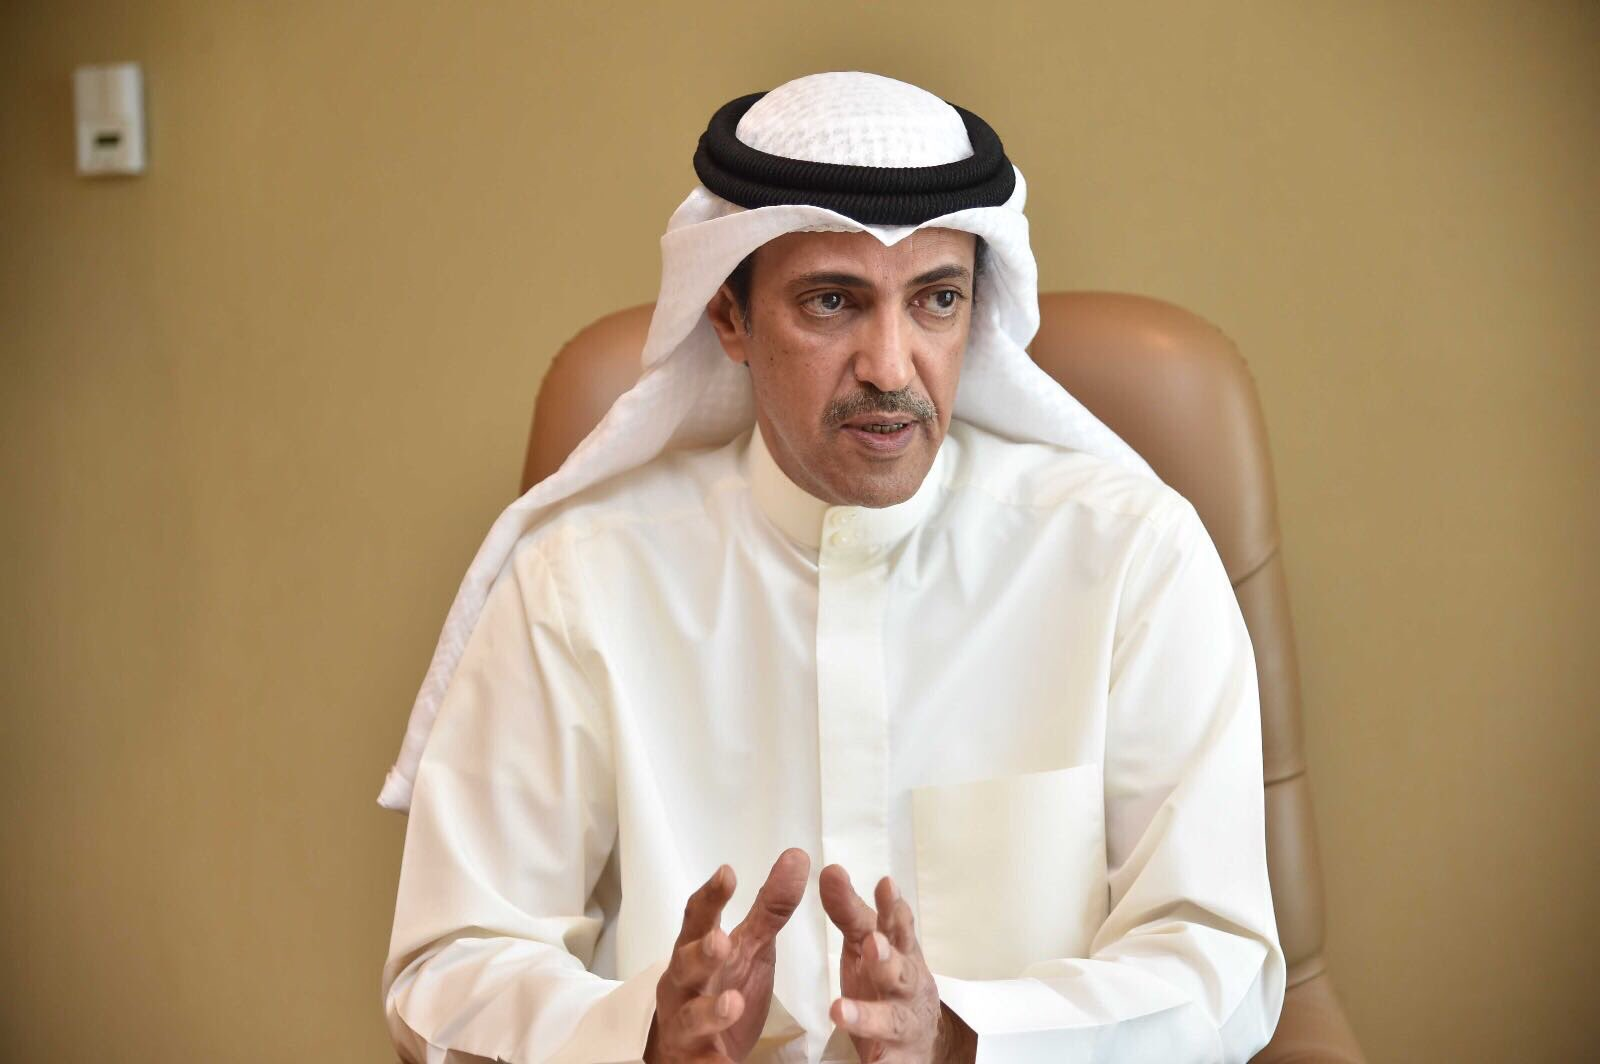 IMG ٢٠١٧٠٩١٢ ٢٠٣٨٠٧ - العتيبي يستفسر من وزيري الداخلية والنفط عن هويات المنطقة المقسومة وخطورتها على أمن الدولة